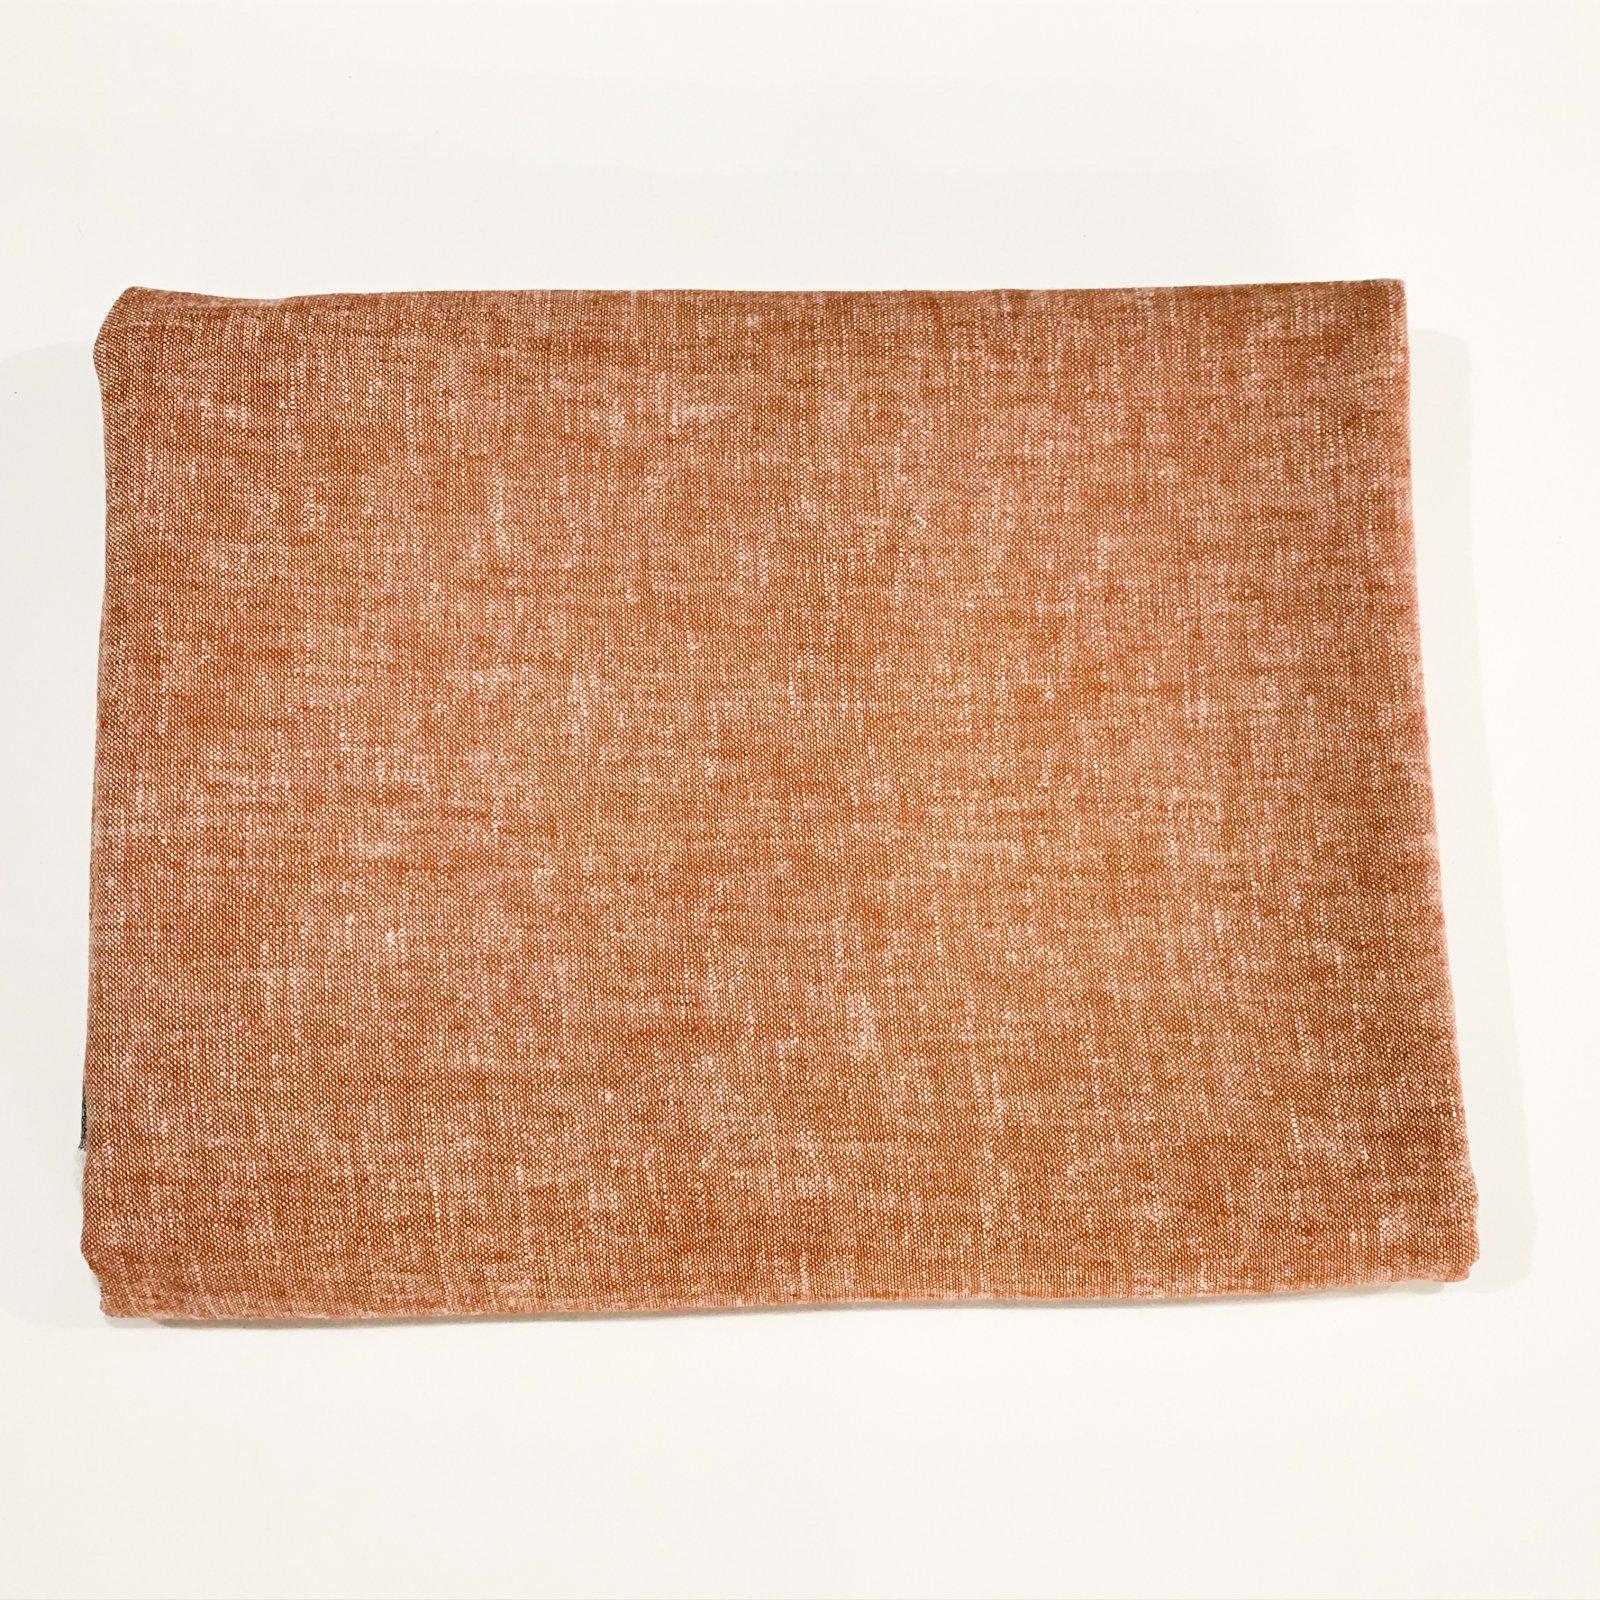 1 3/4 yard - Linen Rayon Yarn Dye - Bedrock